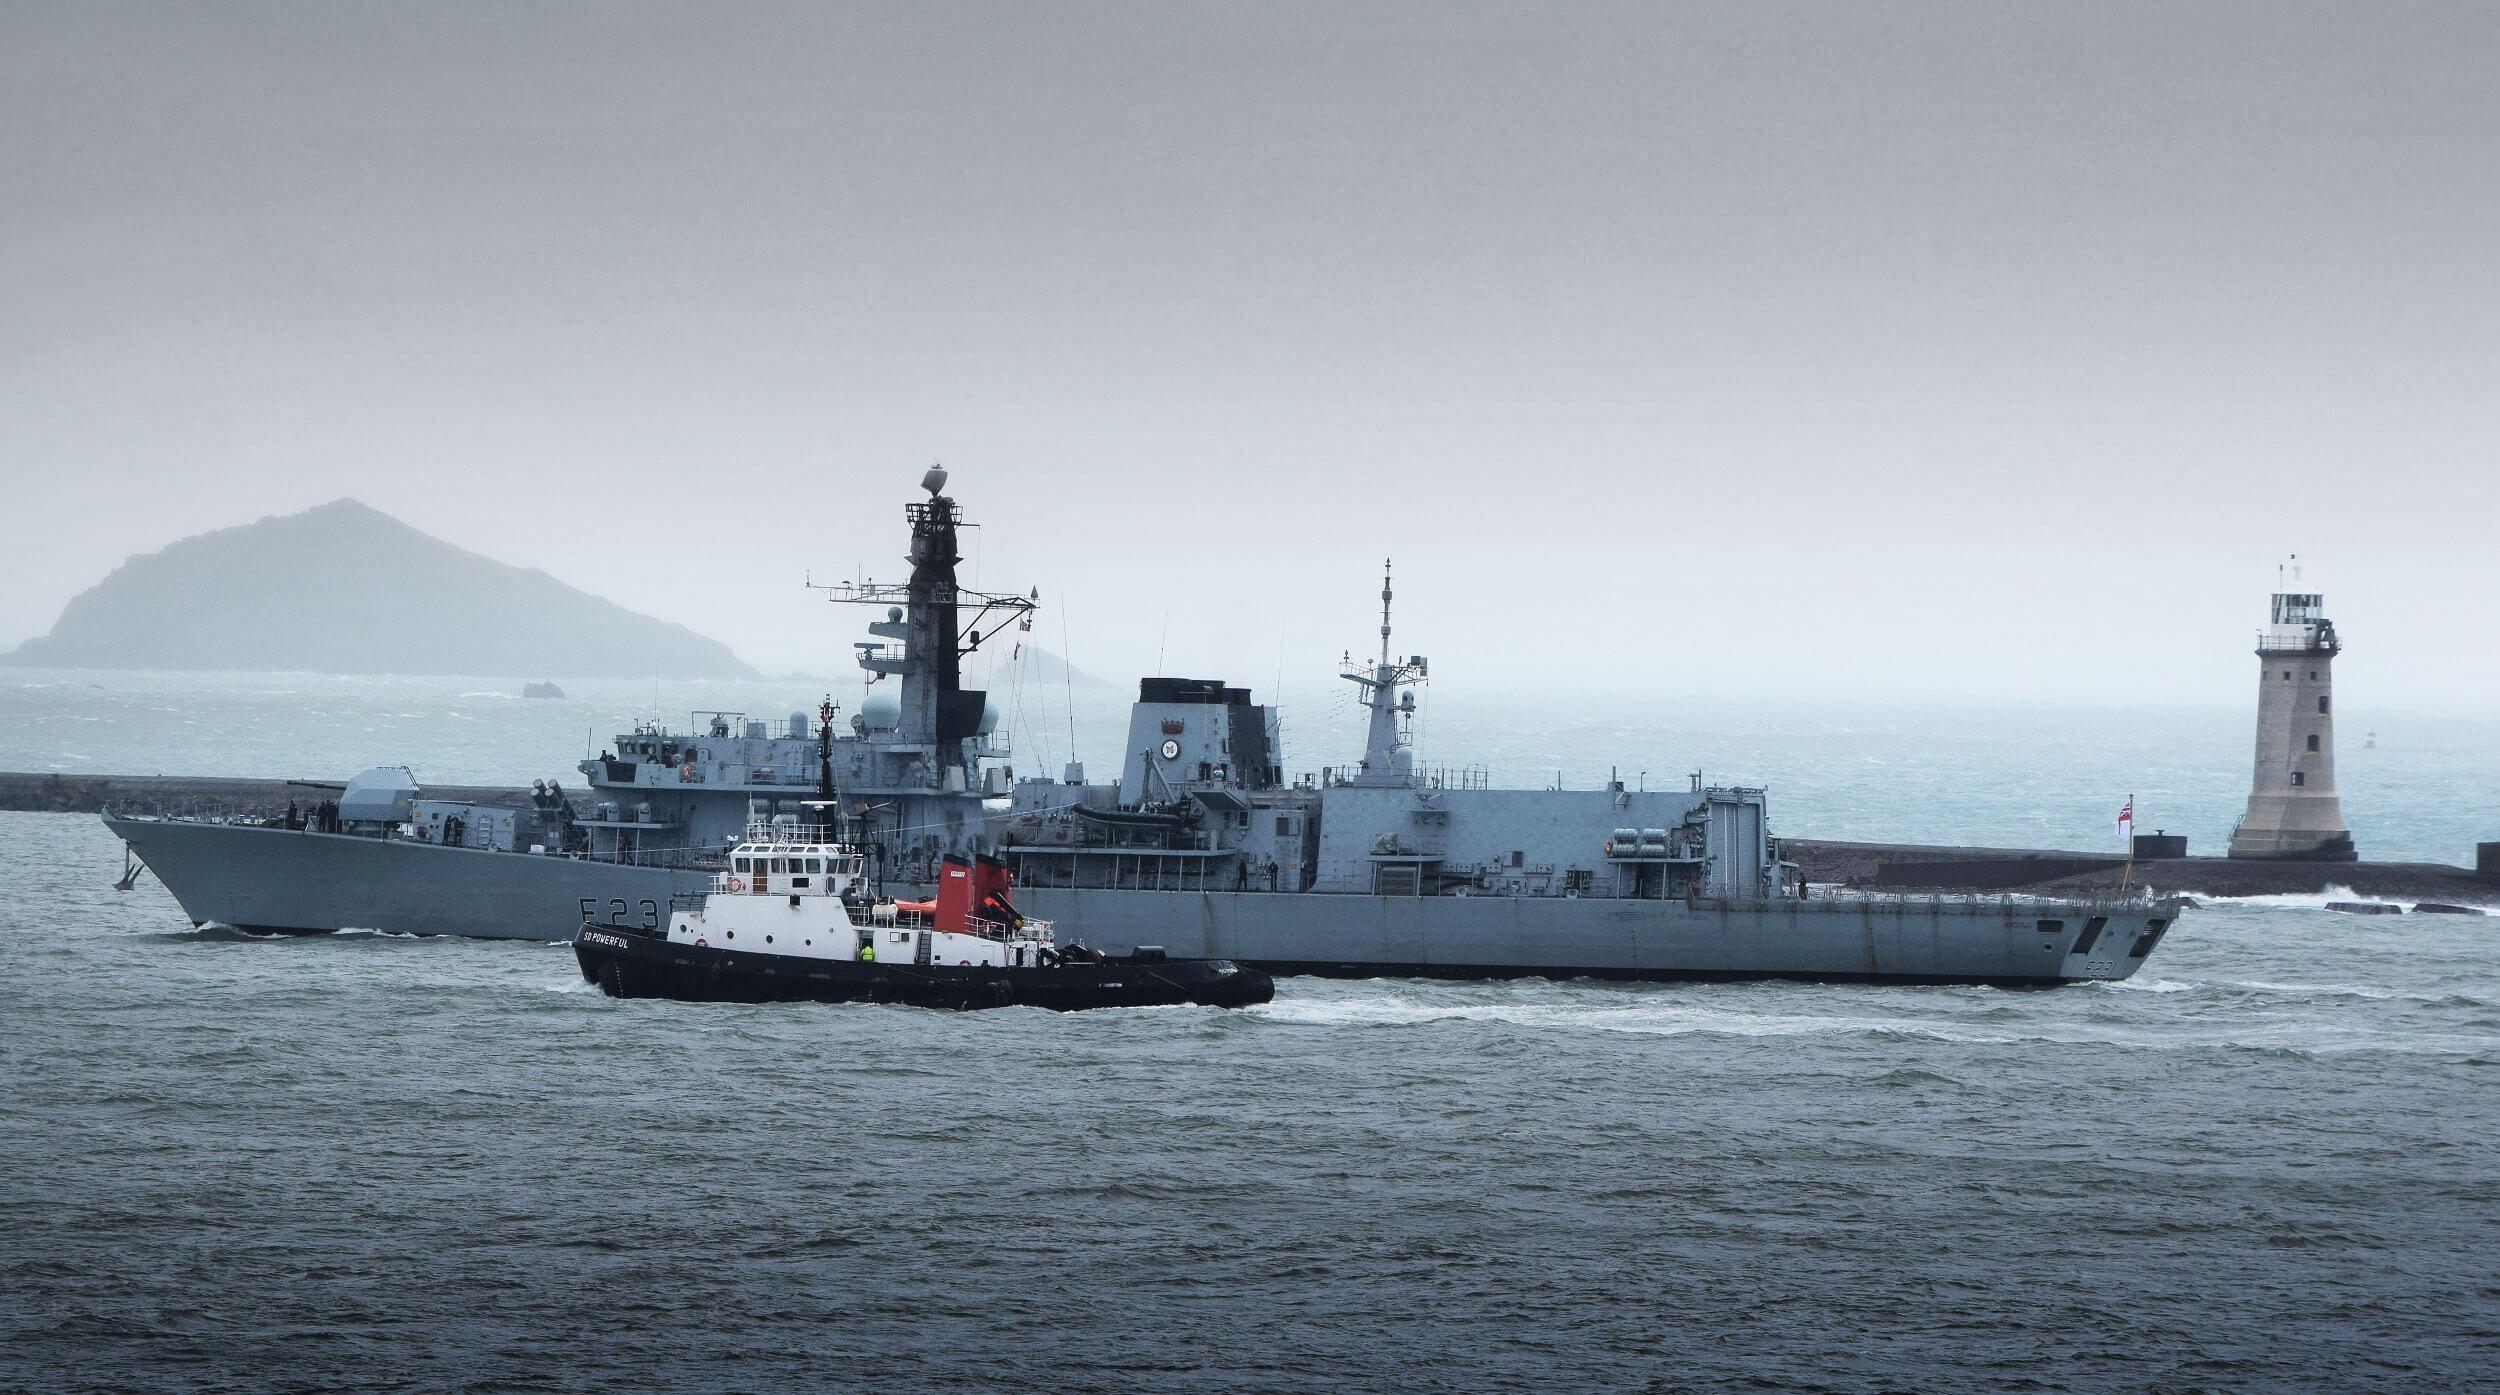 The Royal Navy's oldest frigate completes a memorable global deployment